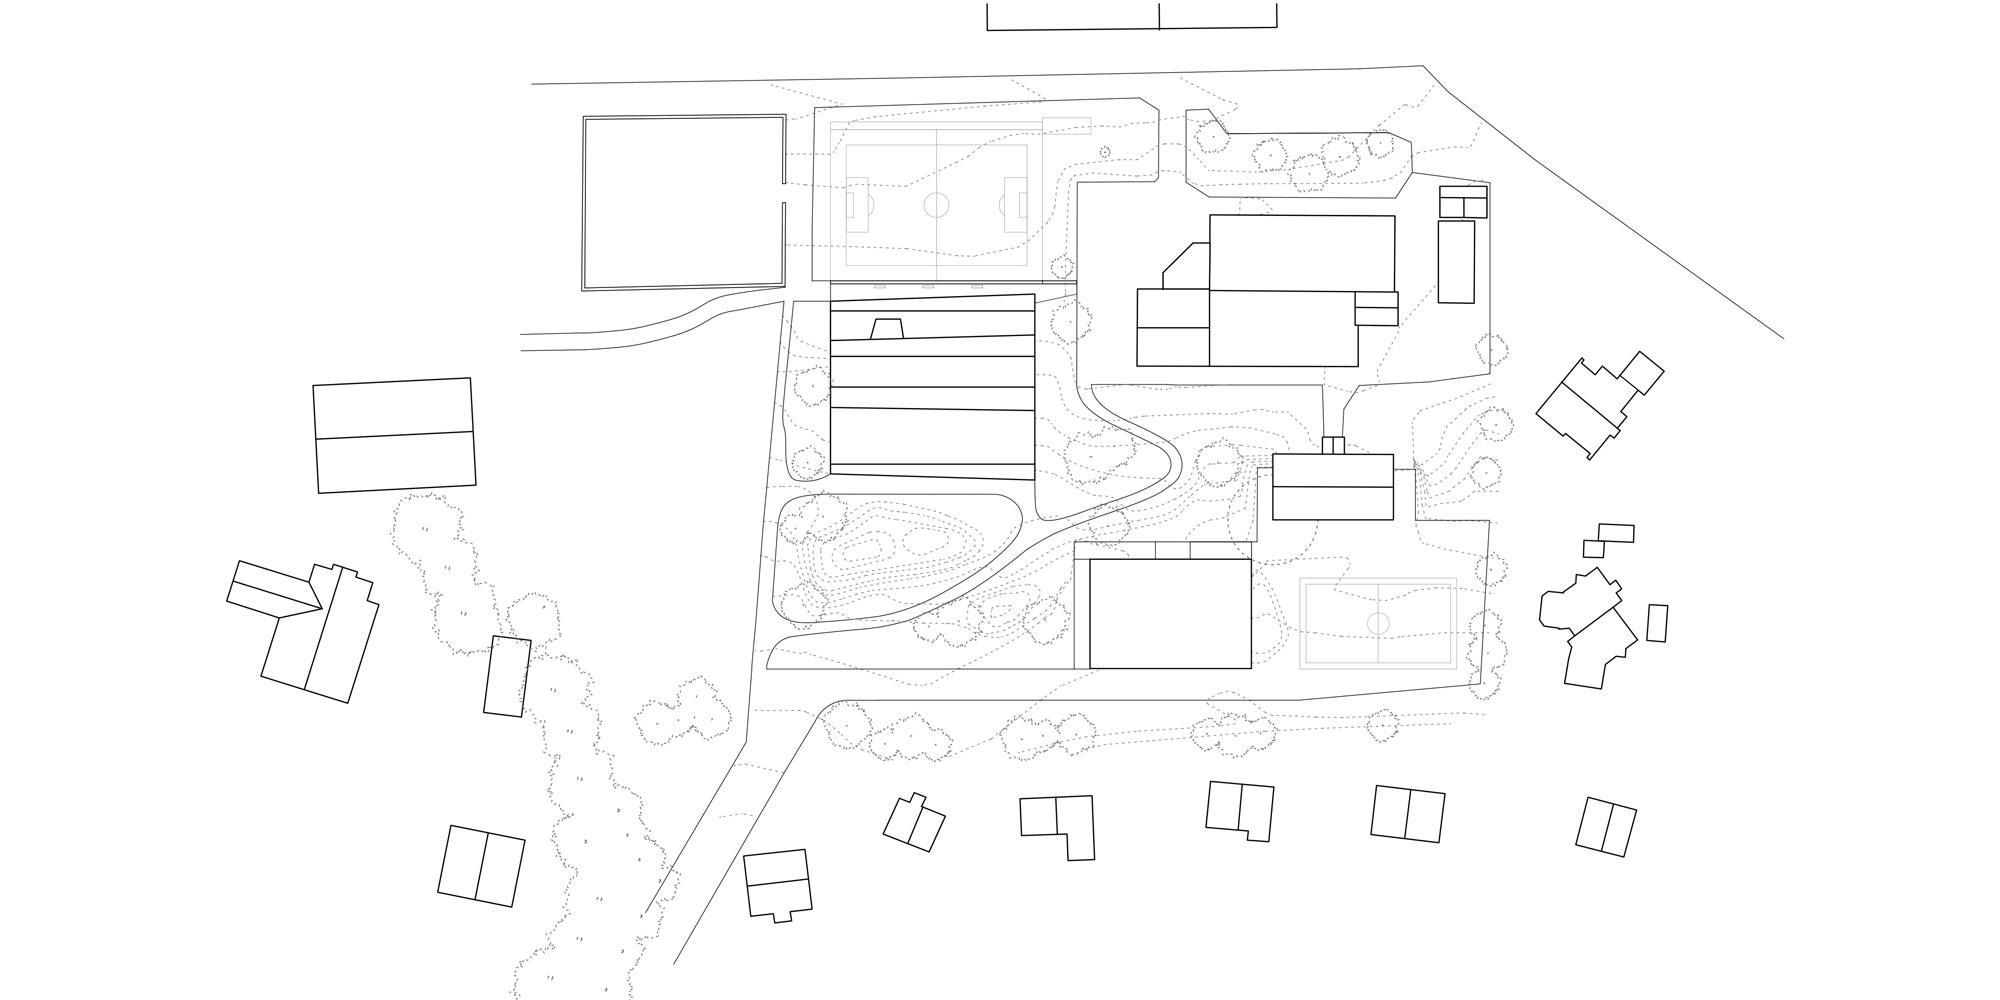 Siteplan © Localarchitecture